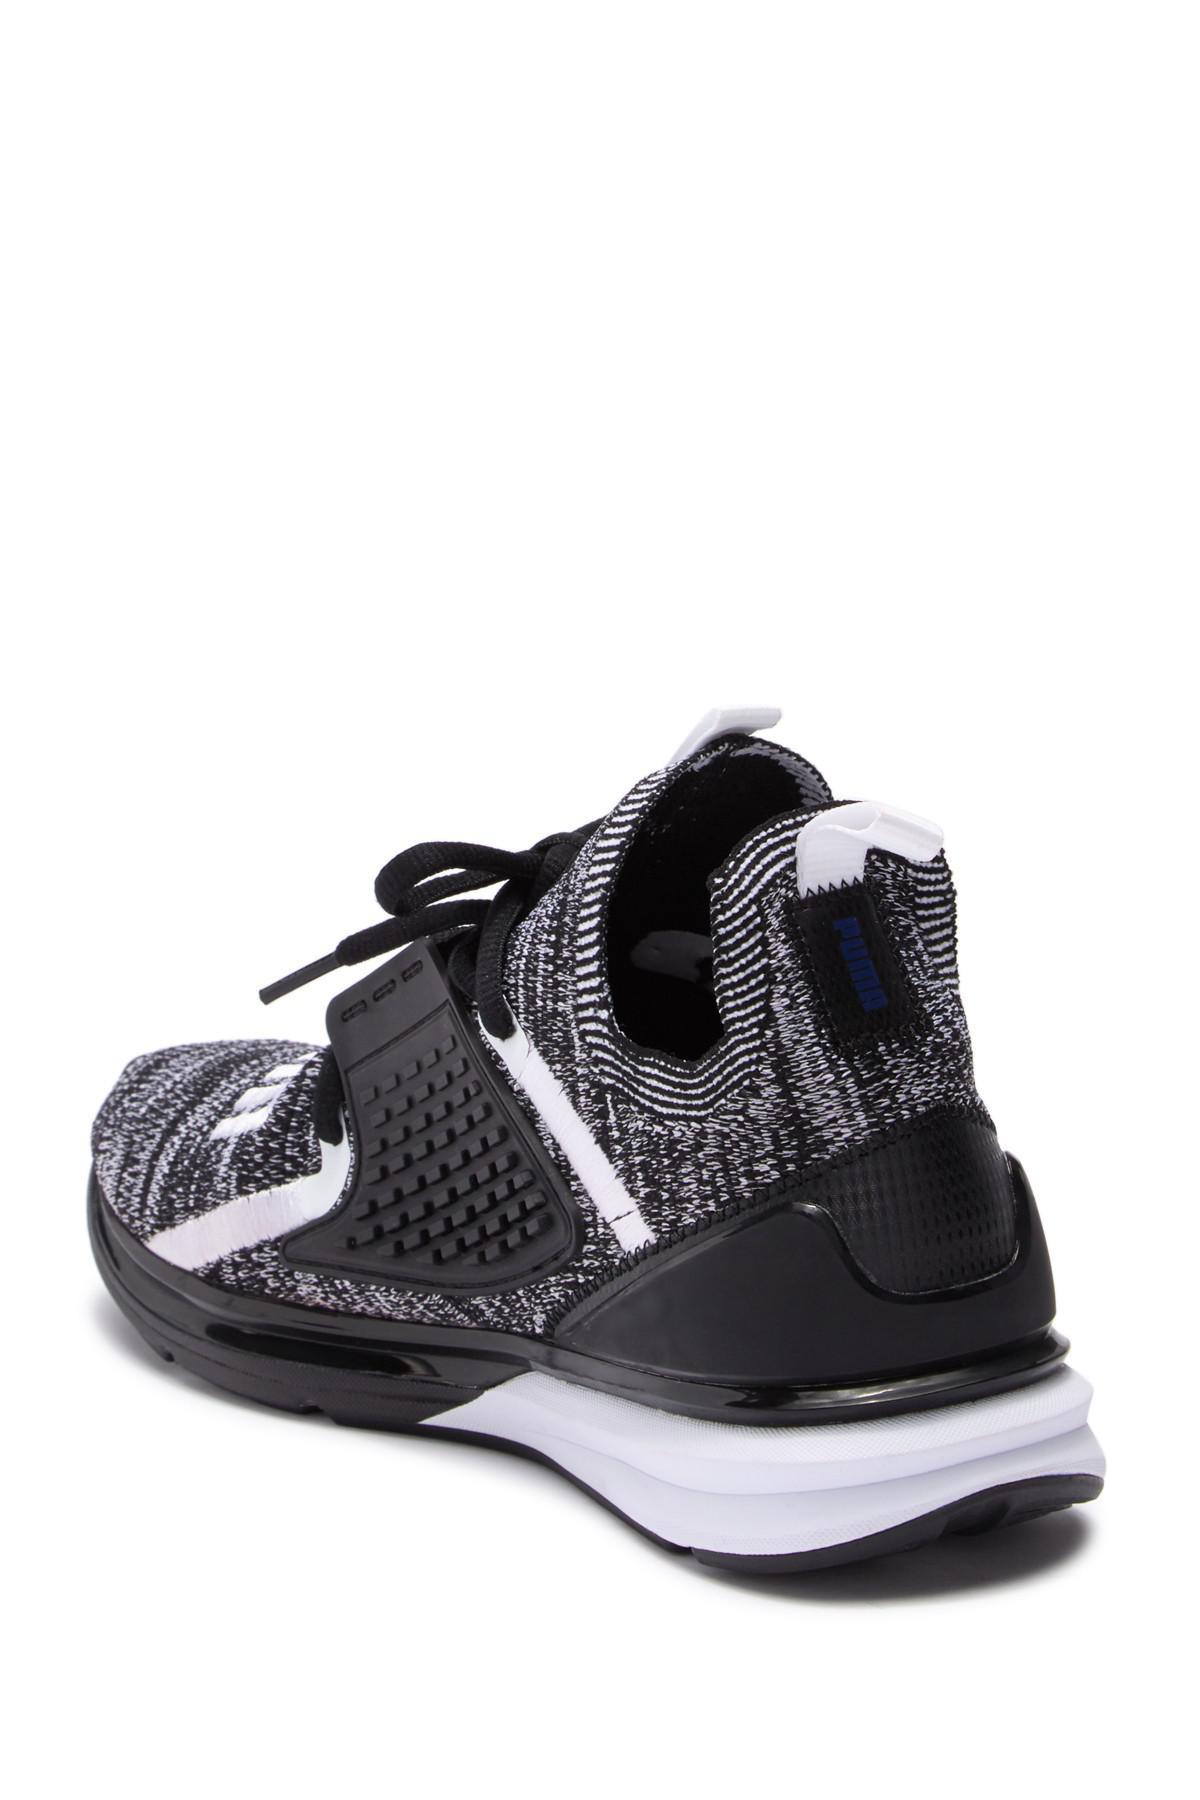 PUMA - Black Ignite Limitless 2 Evoknit Block Sneaker for Men - Lyst. View  fullscreen 5bd08f48c